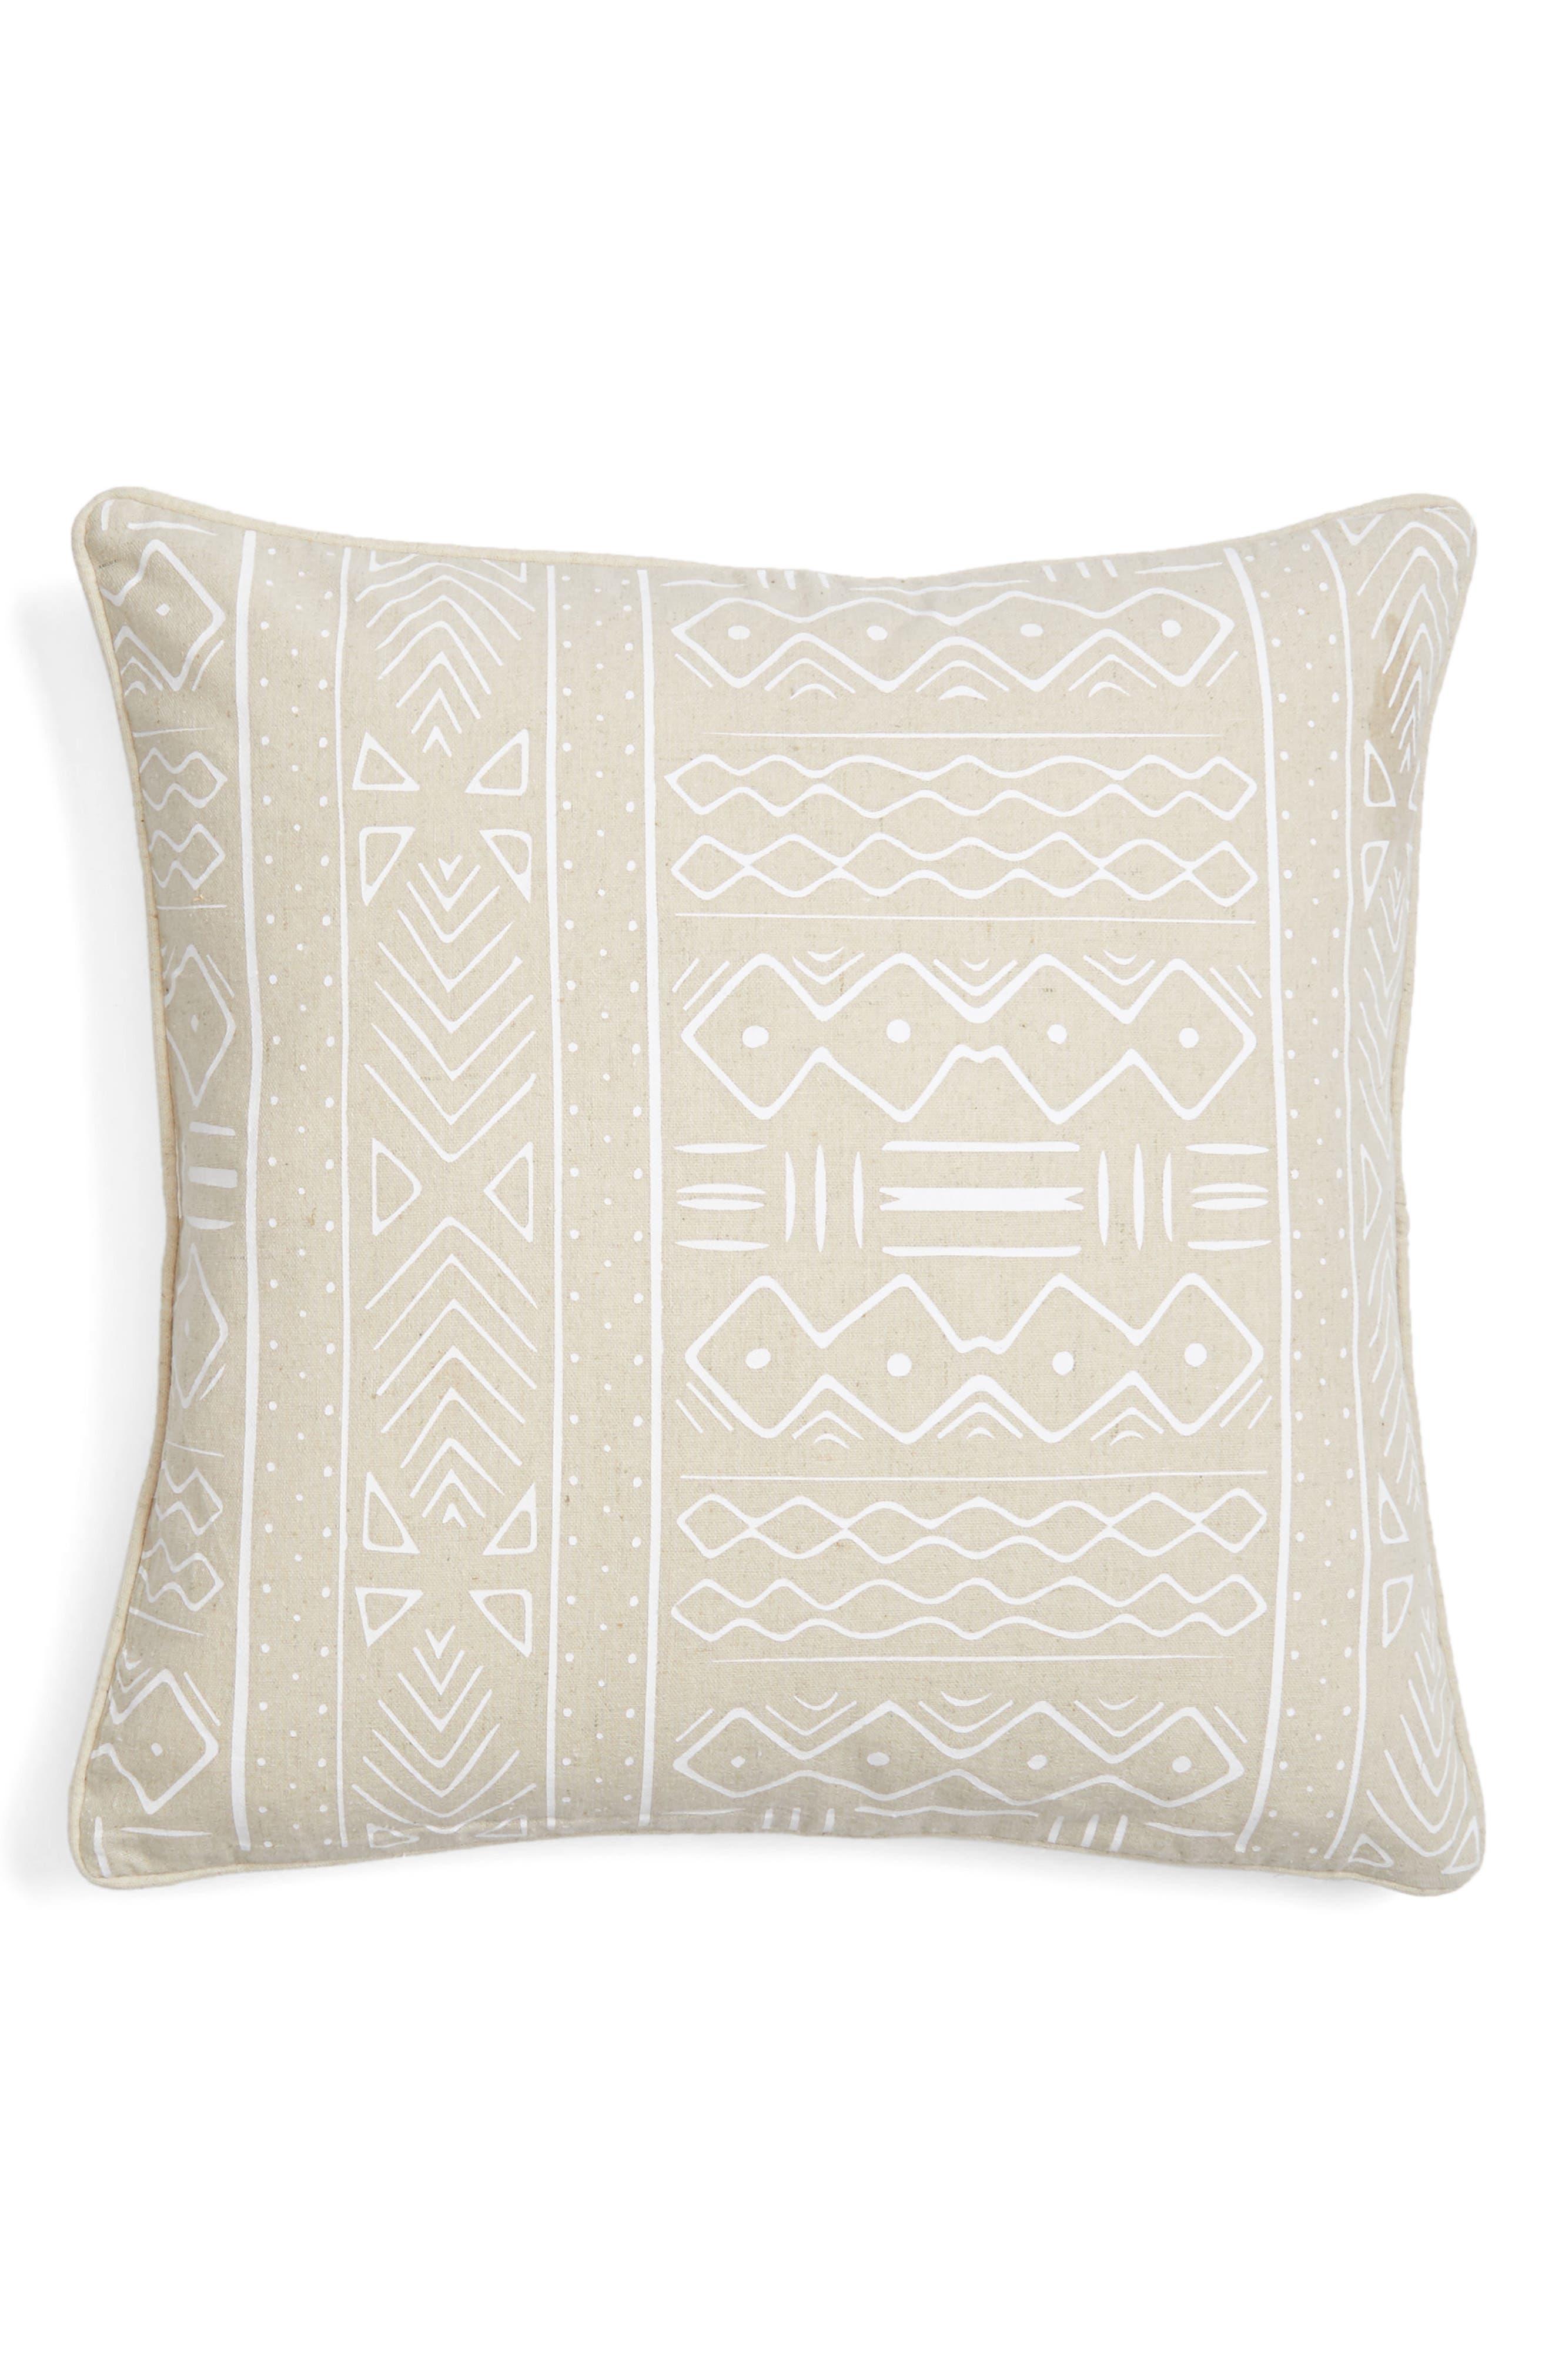 Pinch Mudcloth Pillow,                         Main,                         color, Natural